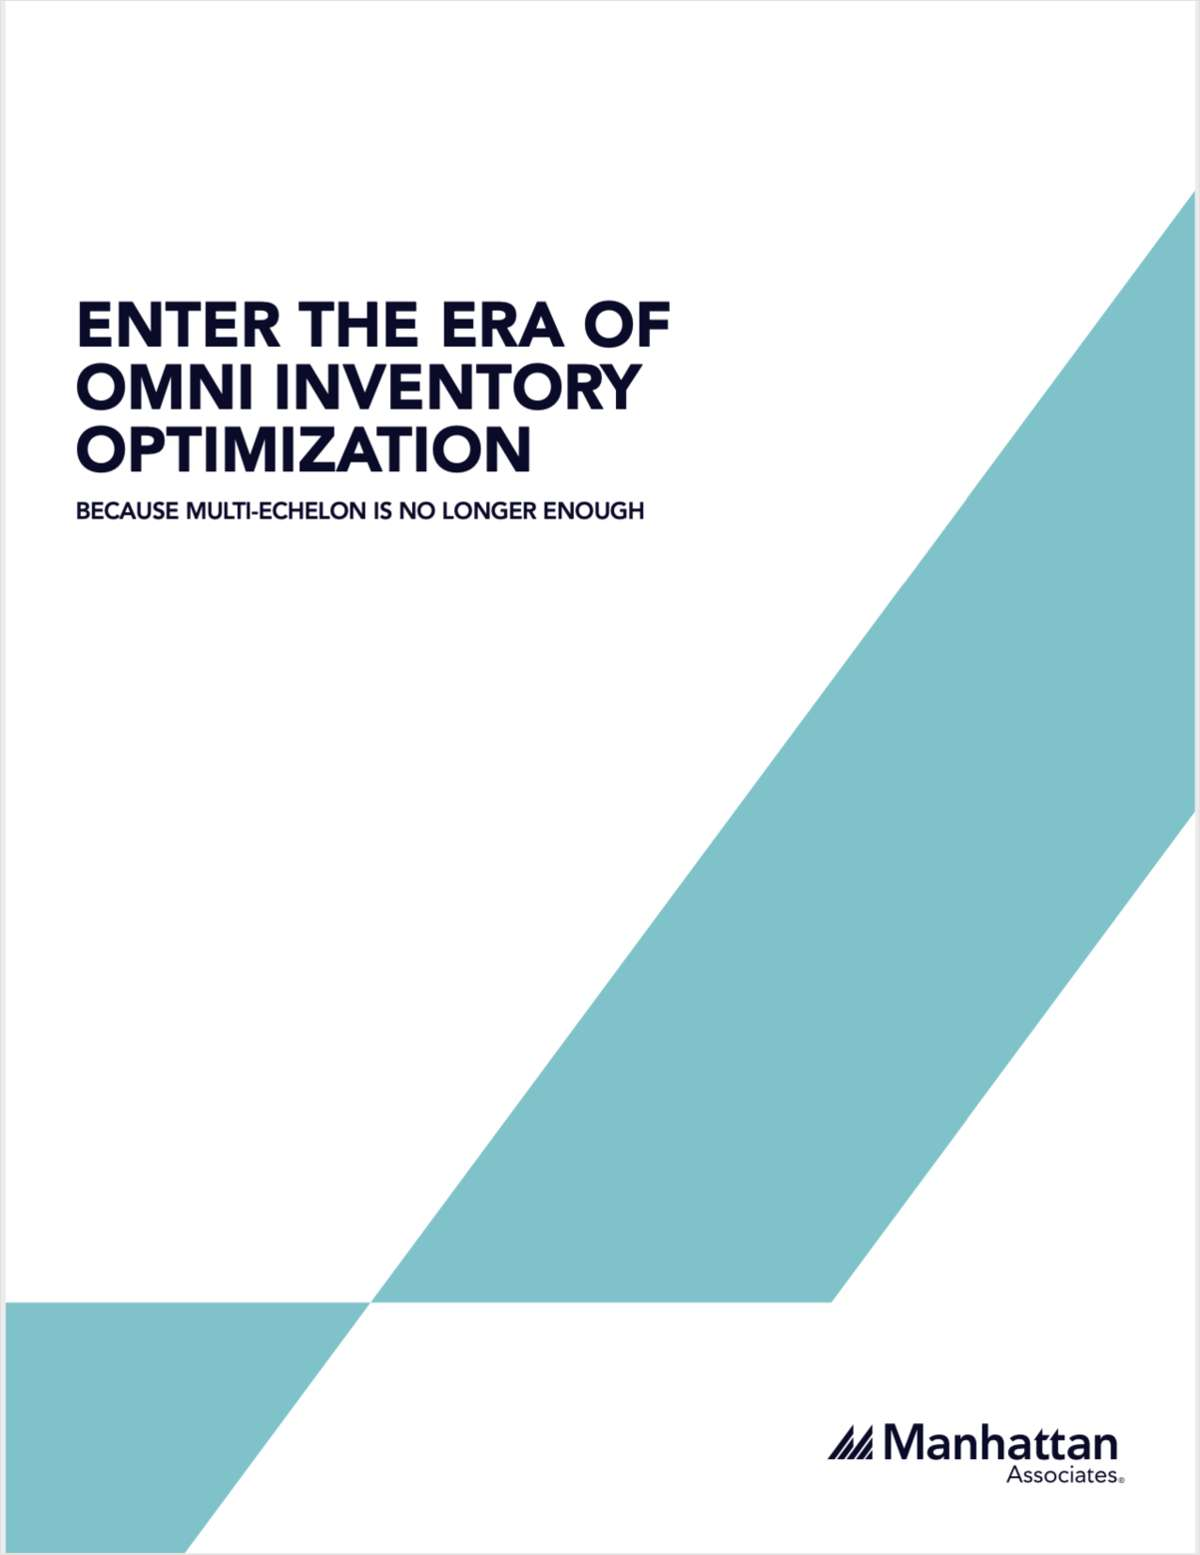 Enter the Era of Omni Inventory Optimization